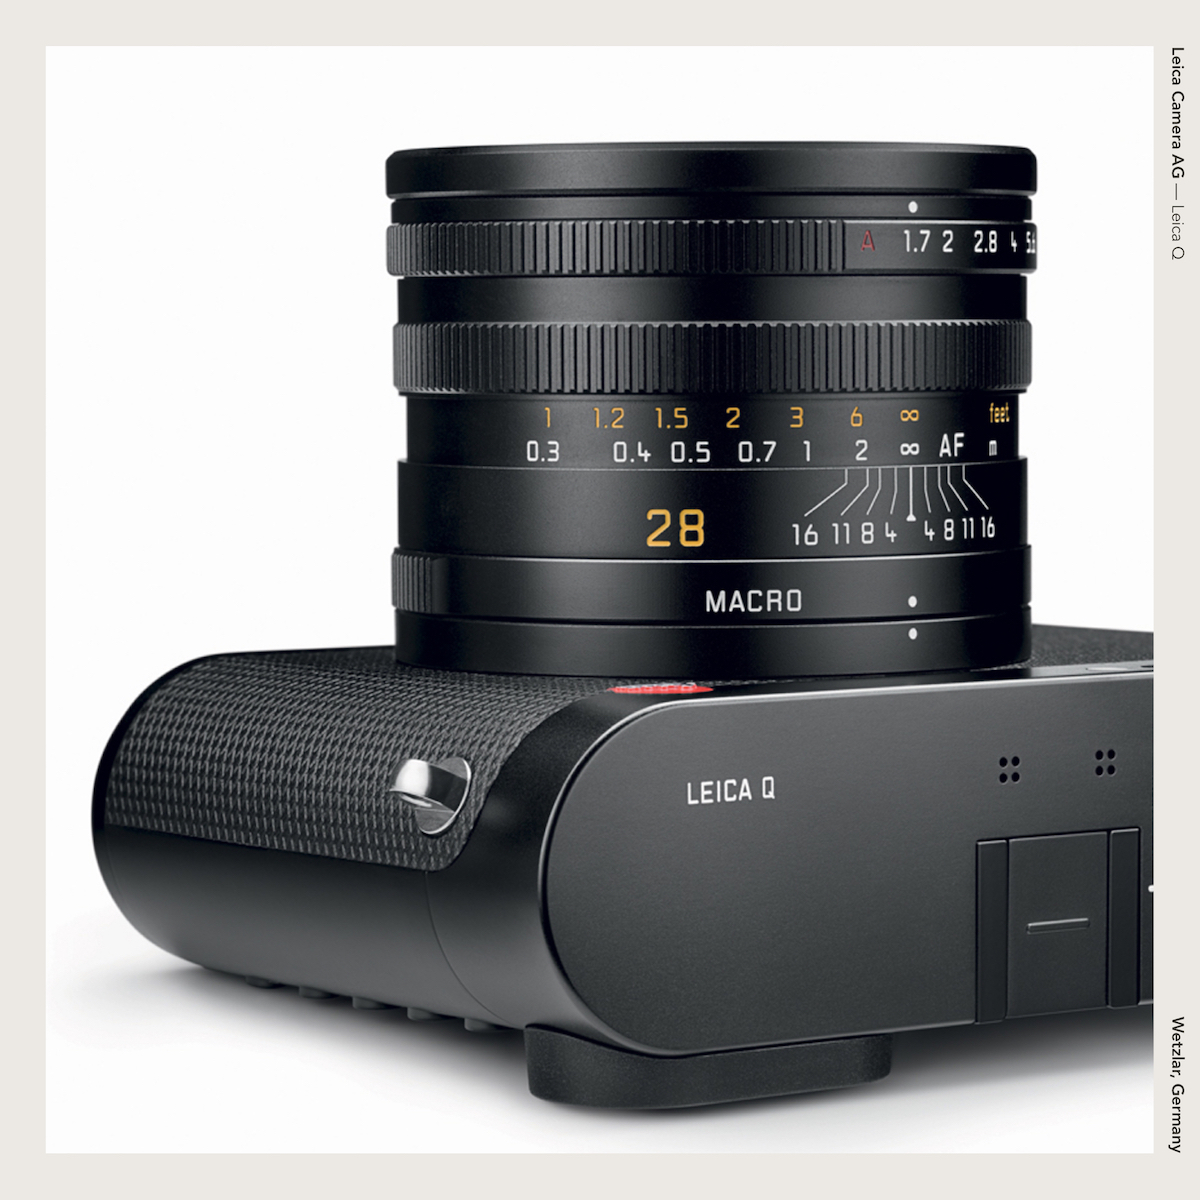 Leica Camera AG — Leica Q